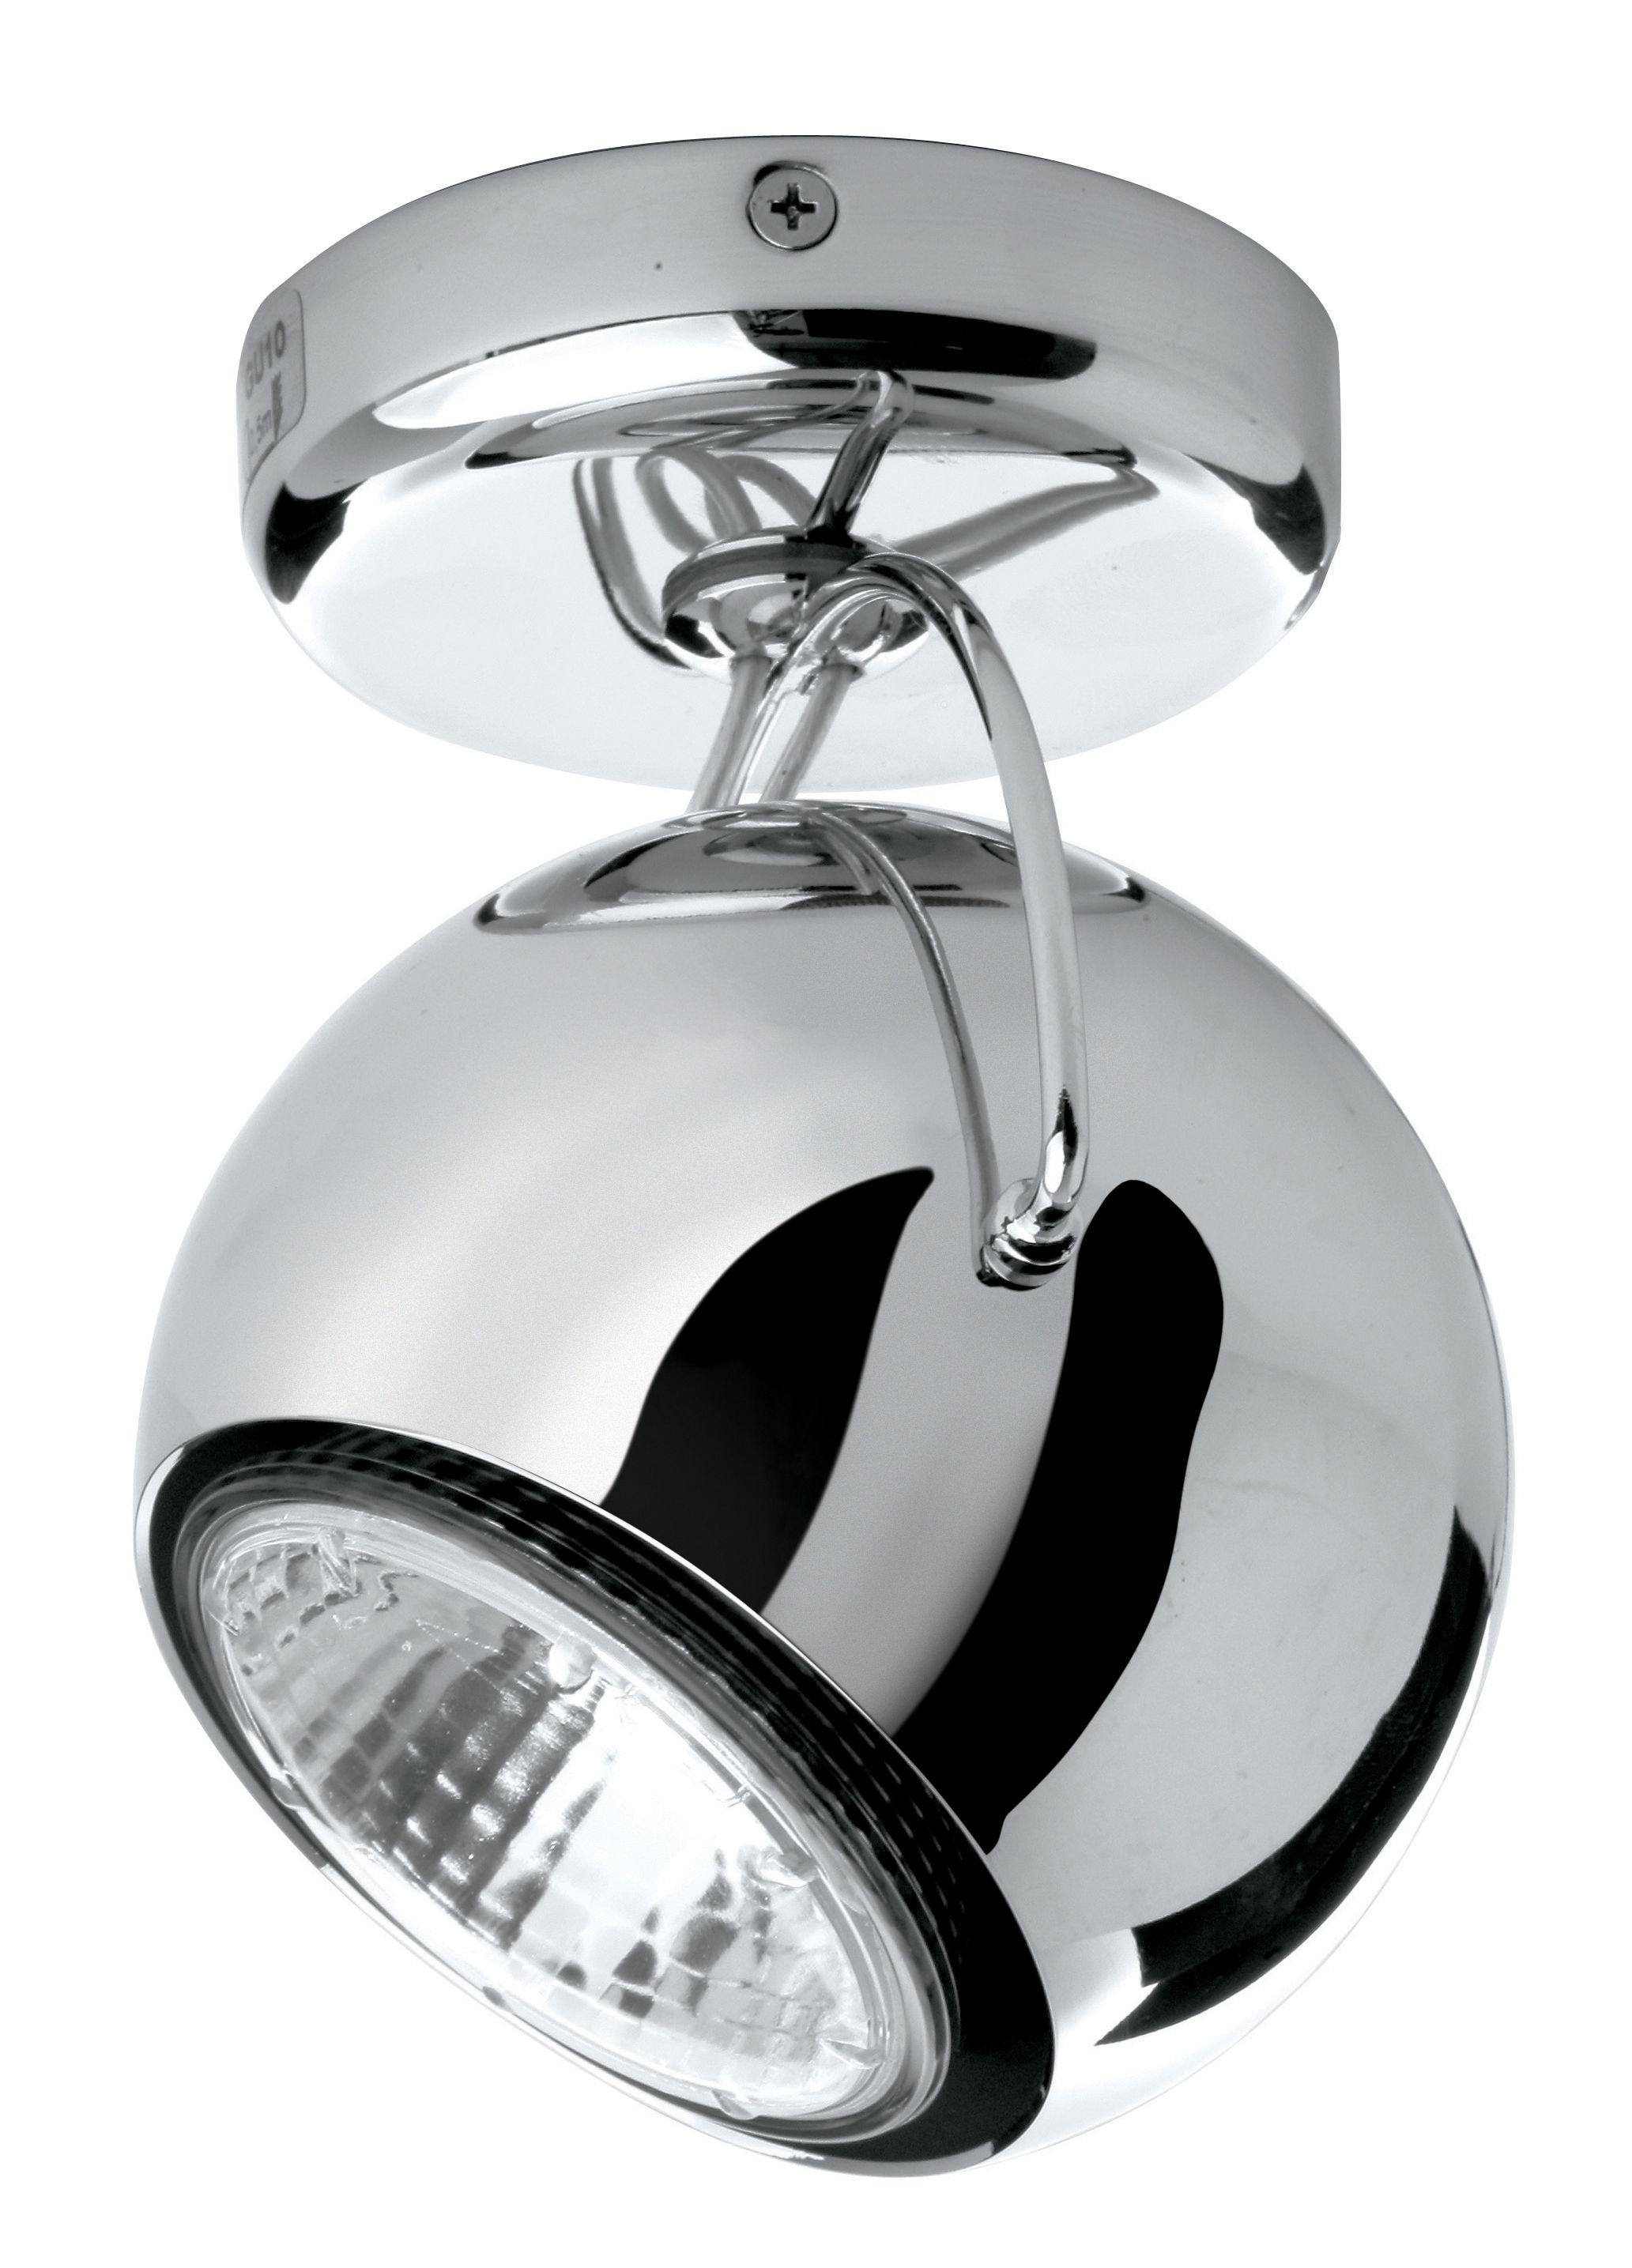 Lighting - Wall Lights - Beluga Wall light - Ceiling light - metal version by Fabbian - chromed - Chromed metal